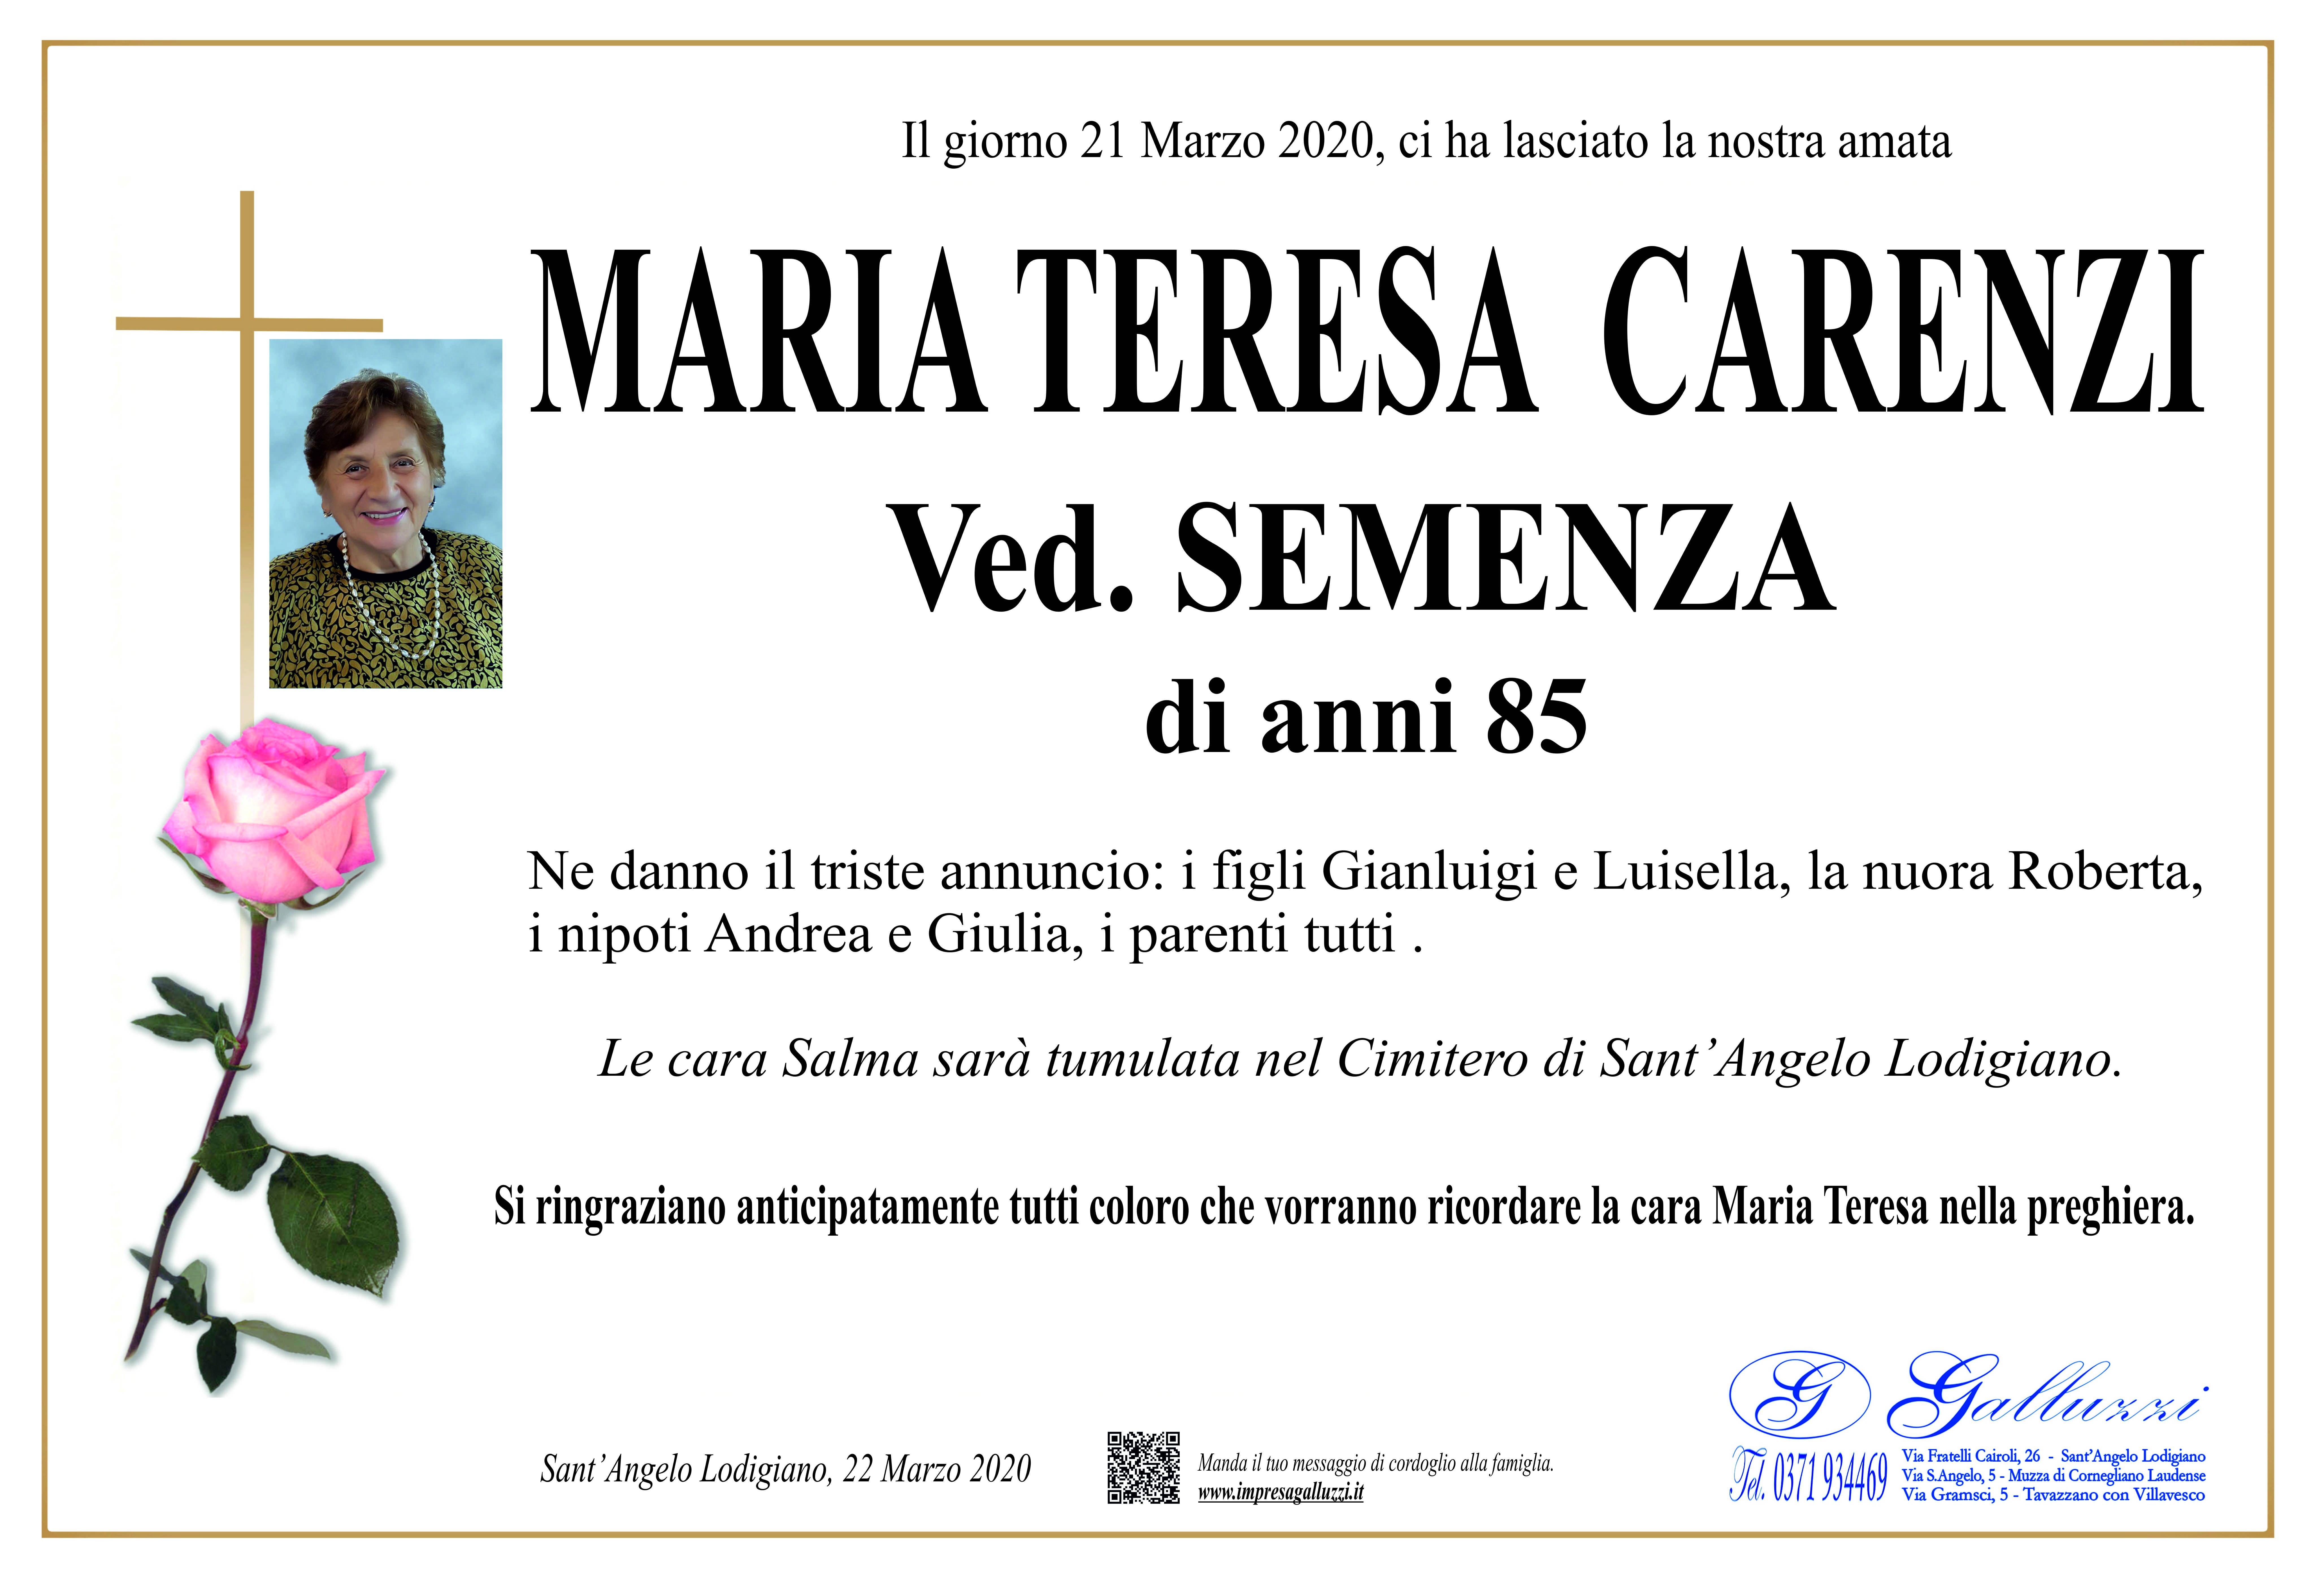 Maria Teresa Carenzi